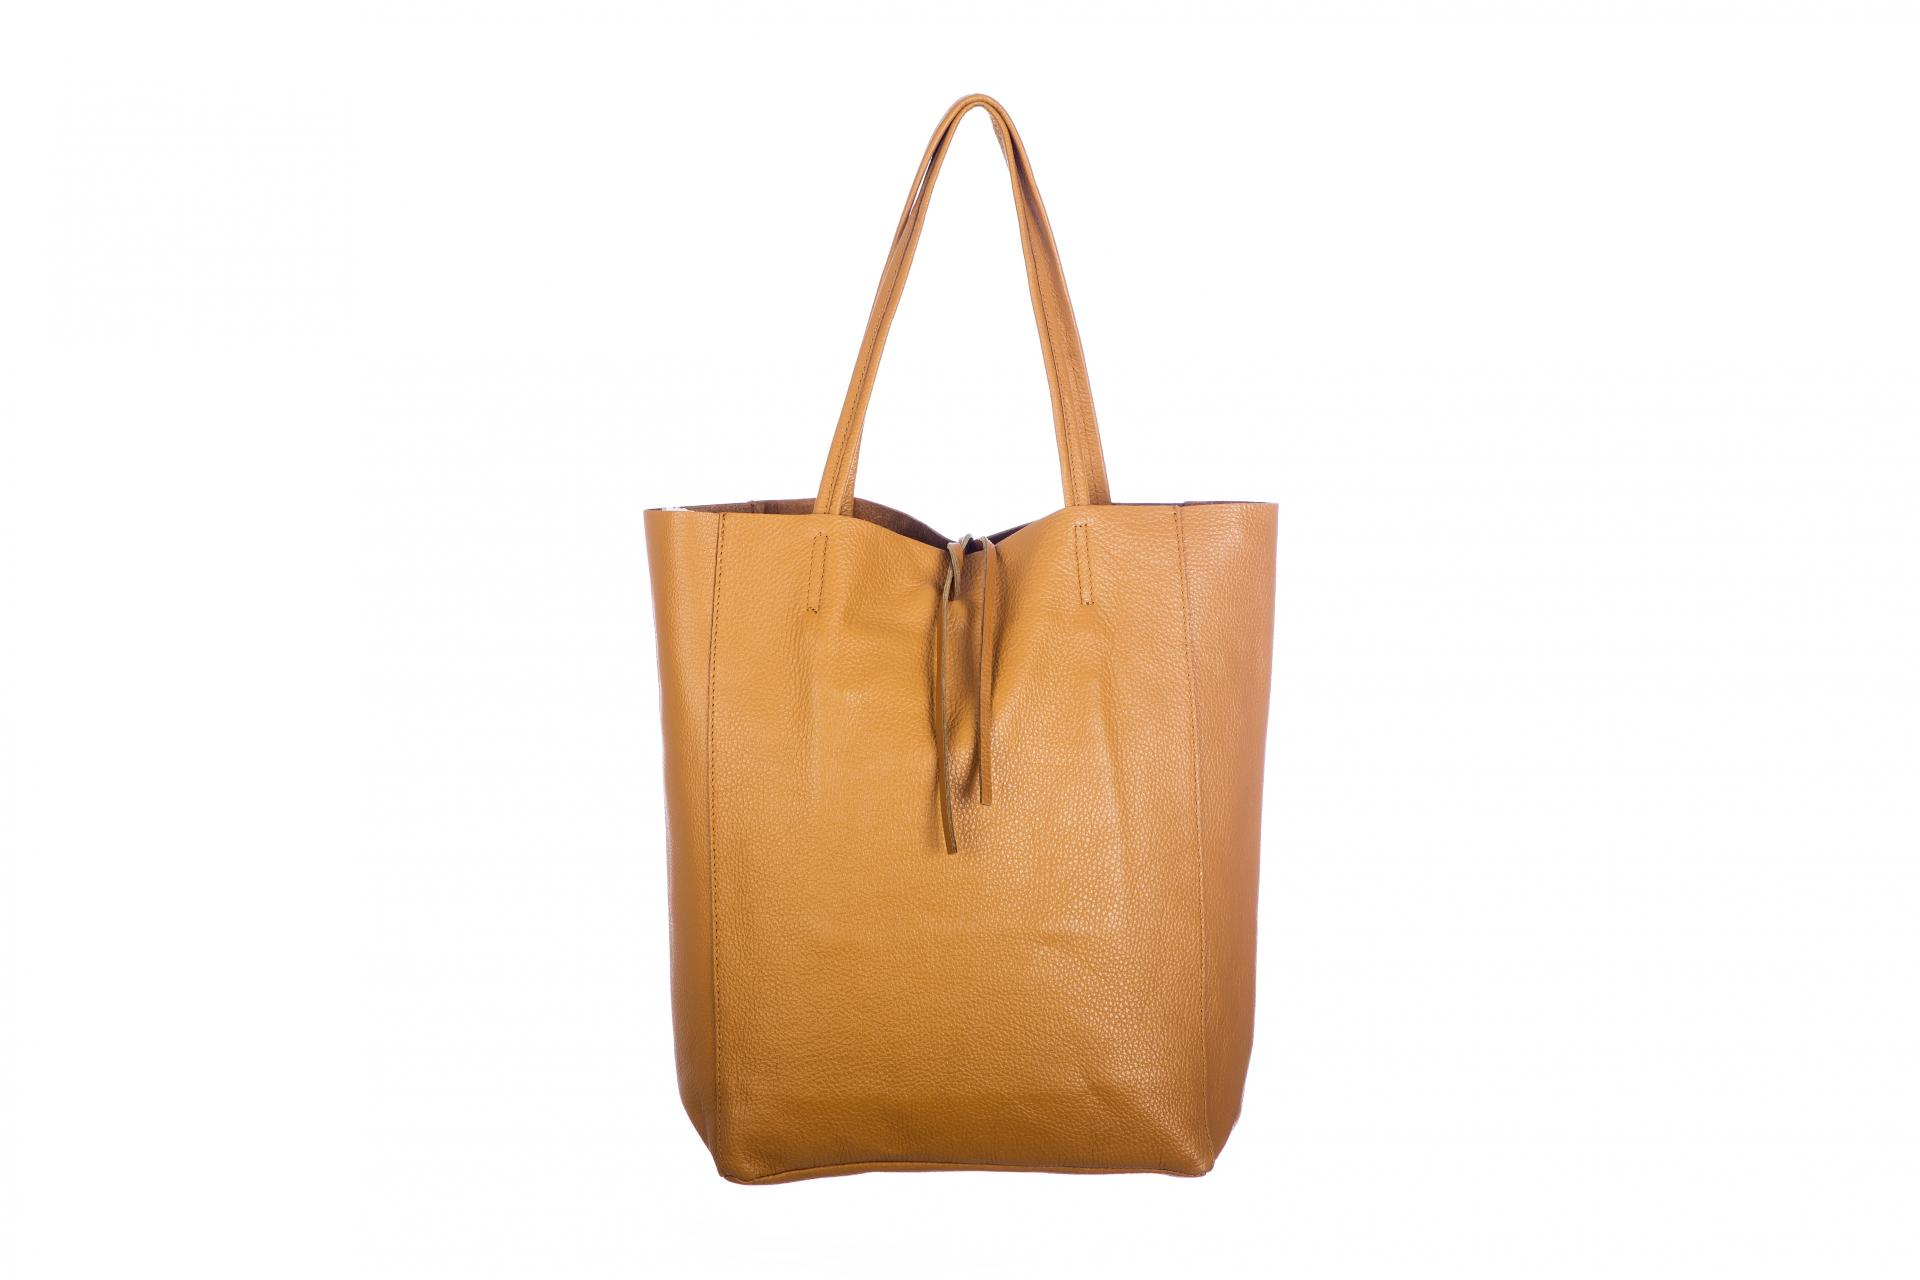 bolso shopper piel camel 582.jpg